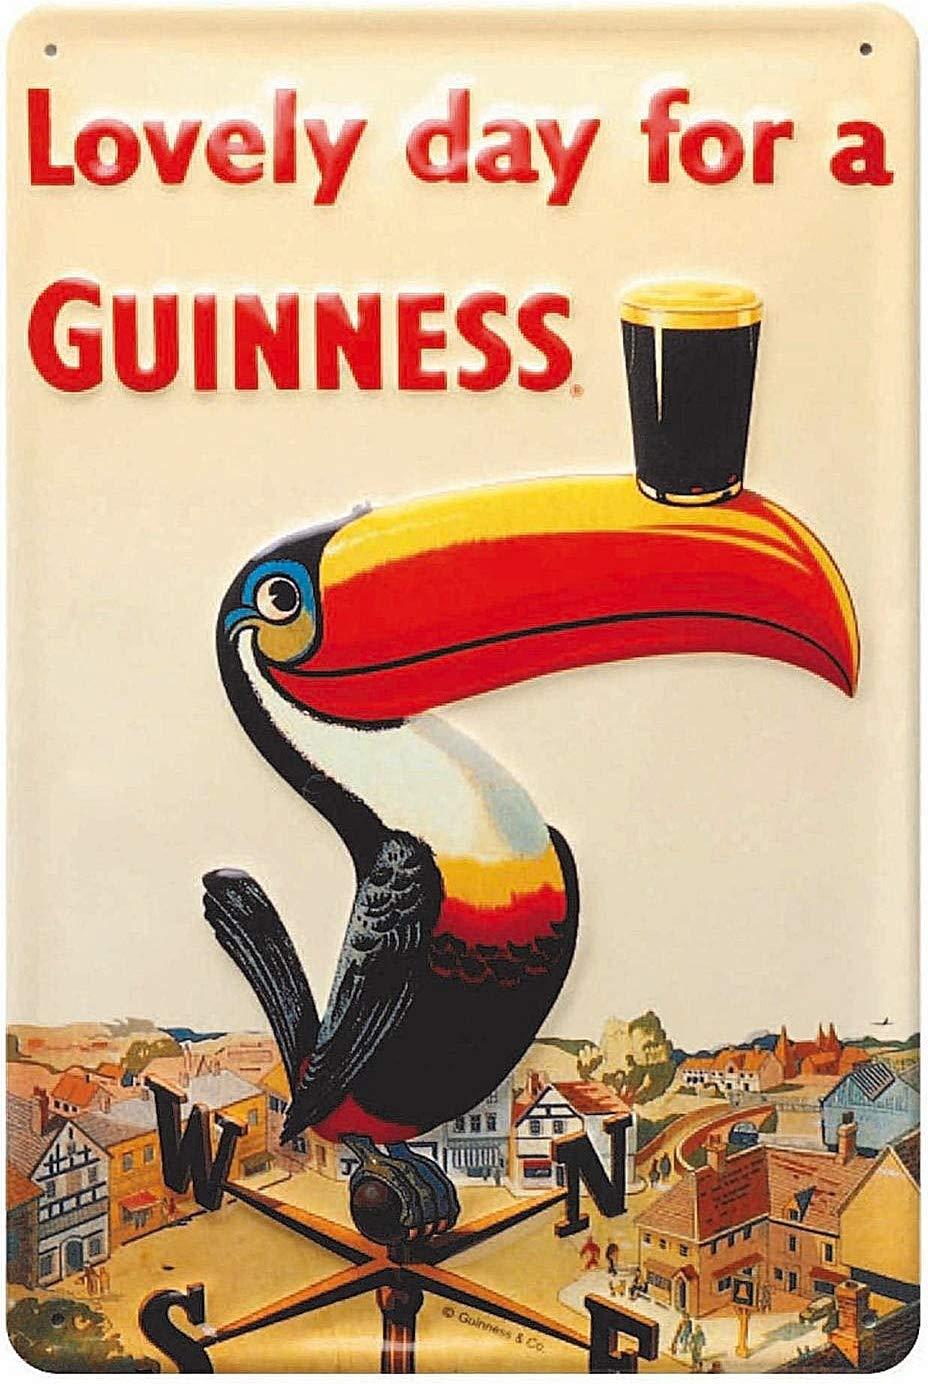 Signo de pared de Metal Guinness (tucán)